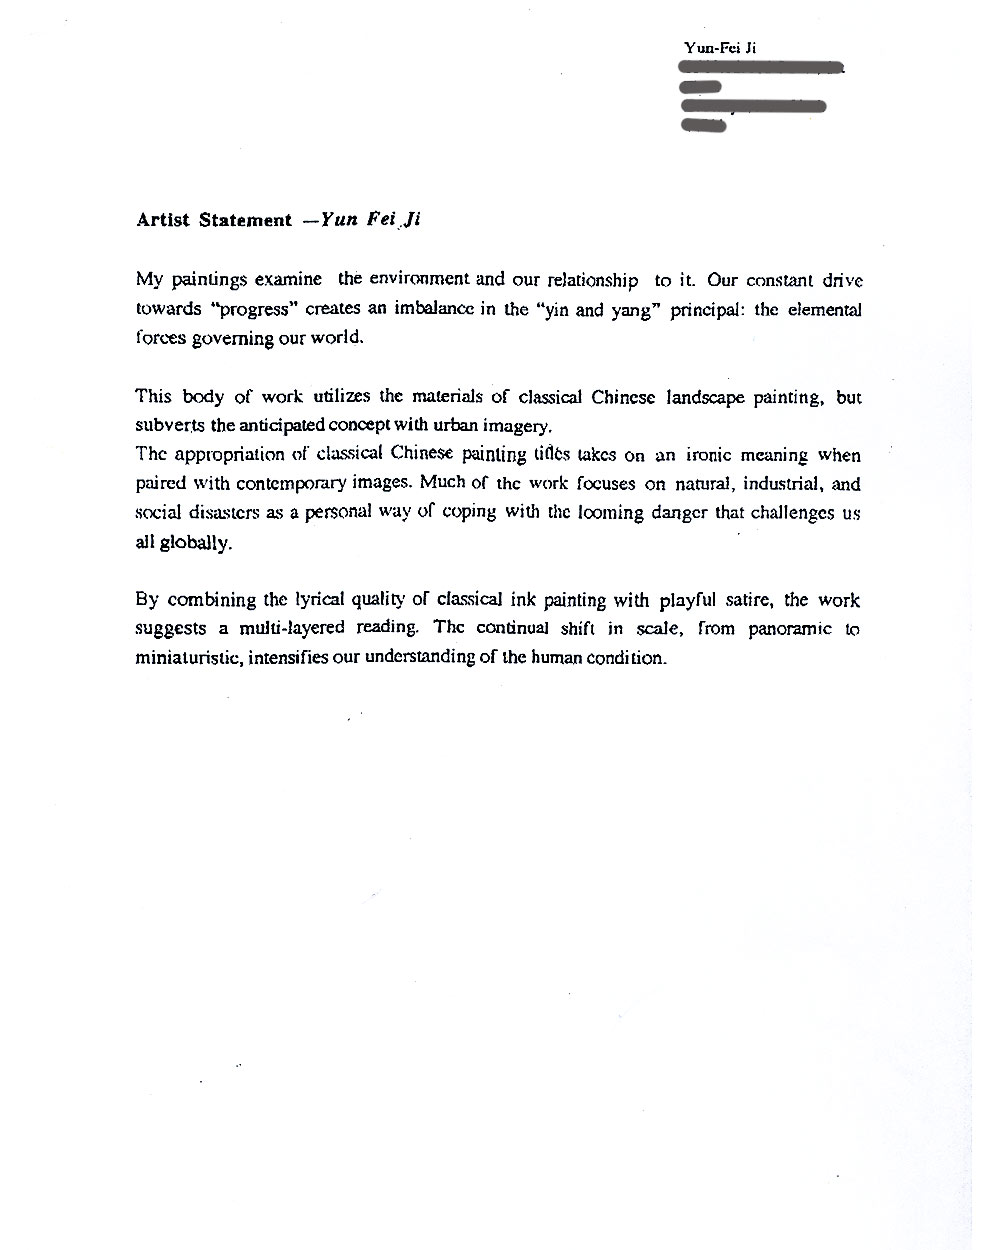 Yun-Fei Ji's Artist Statement, undated